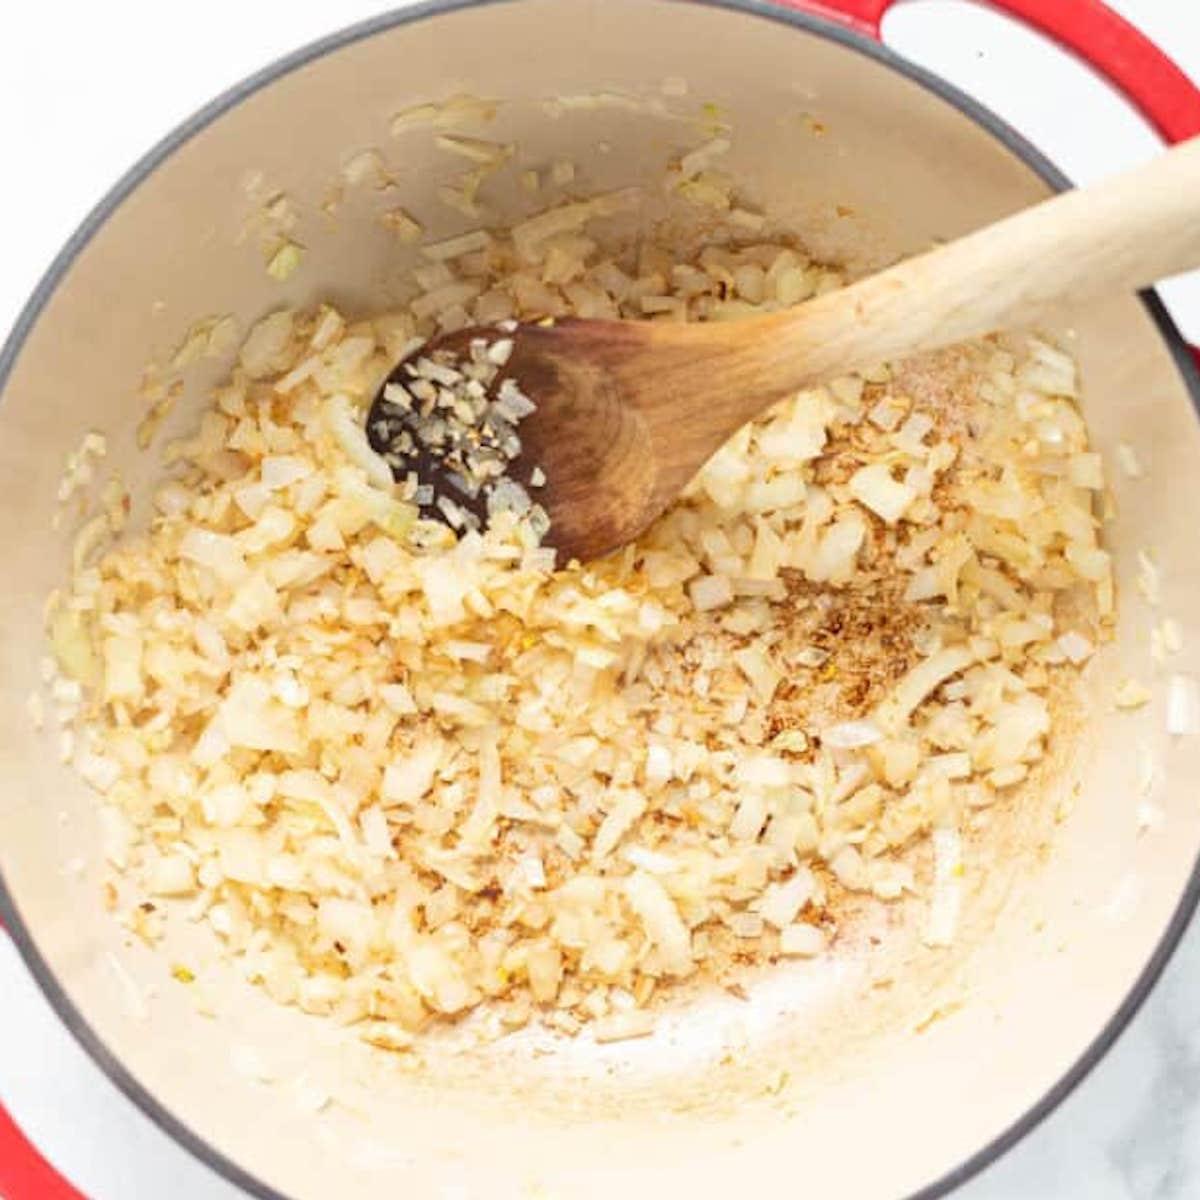 sautéed onions in a pan